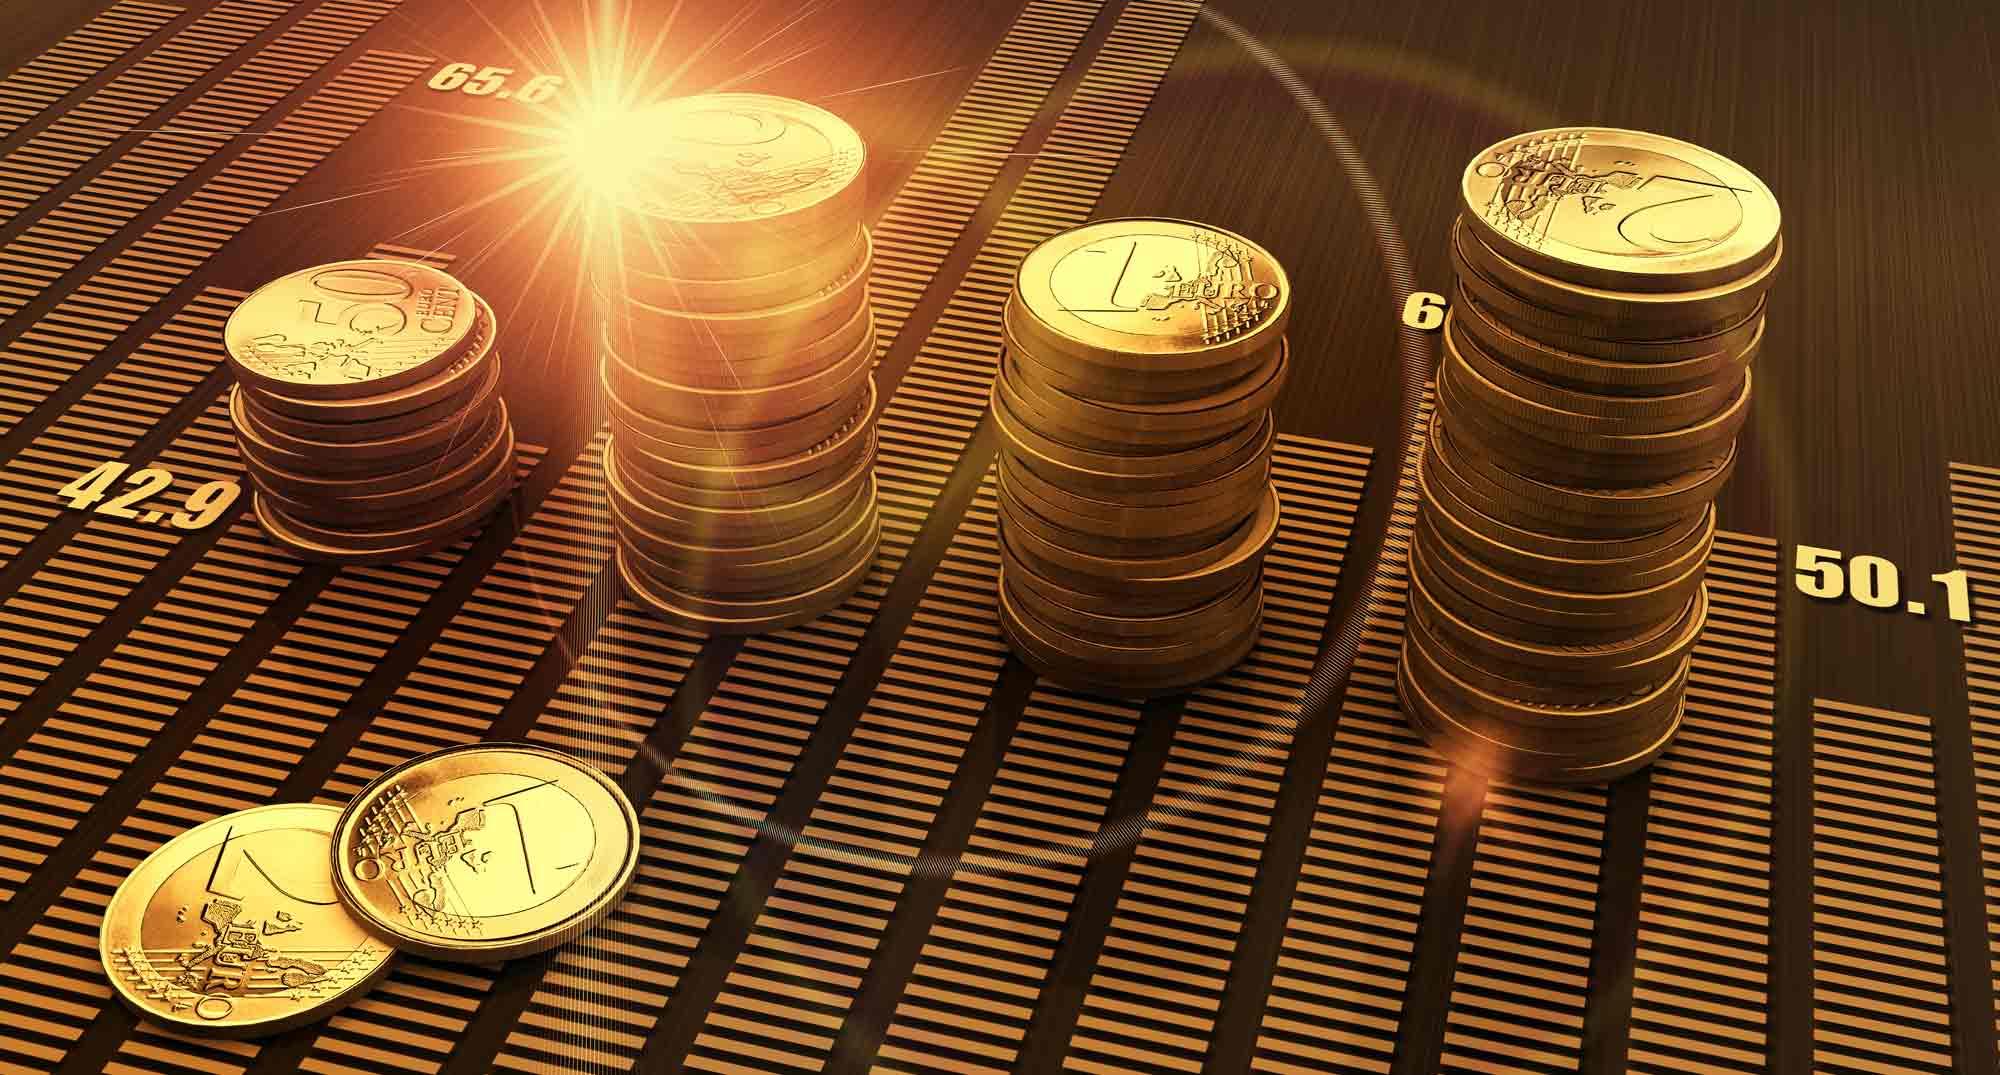 FINANCE: Women & Investing Part 5